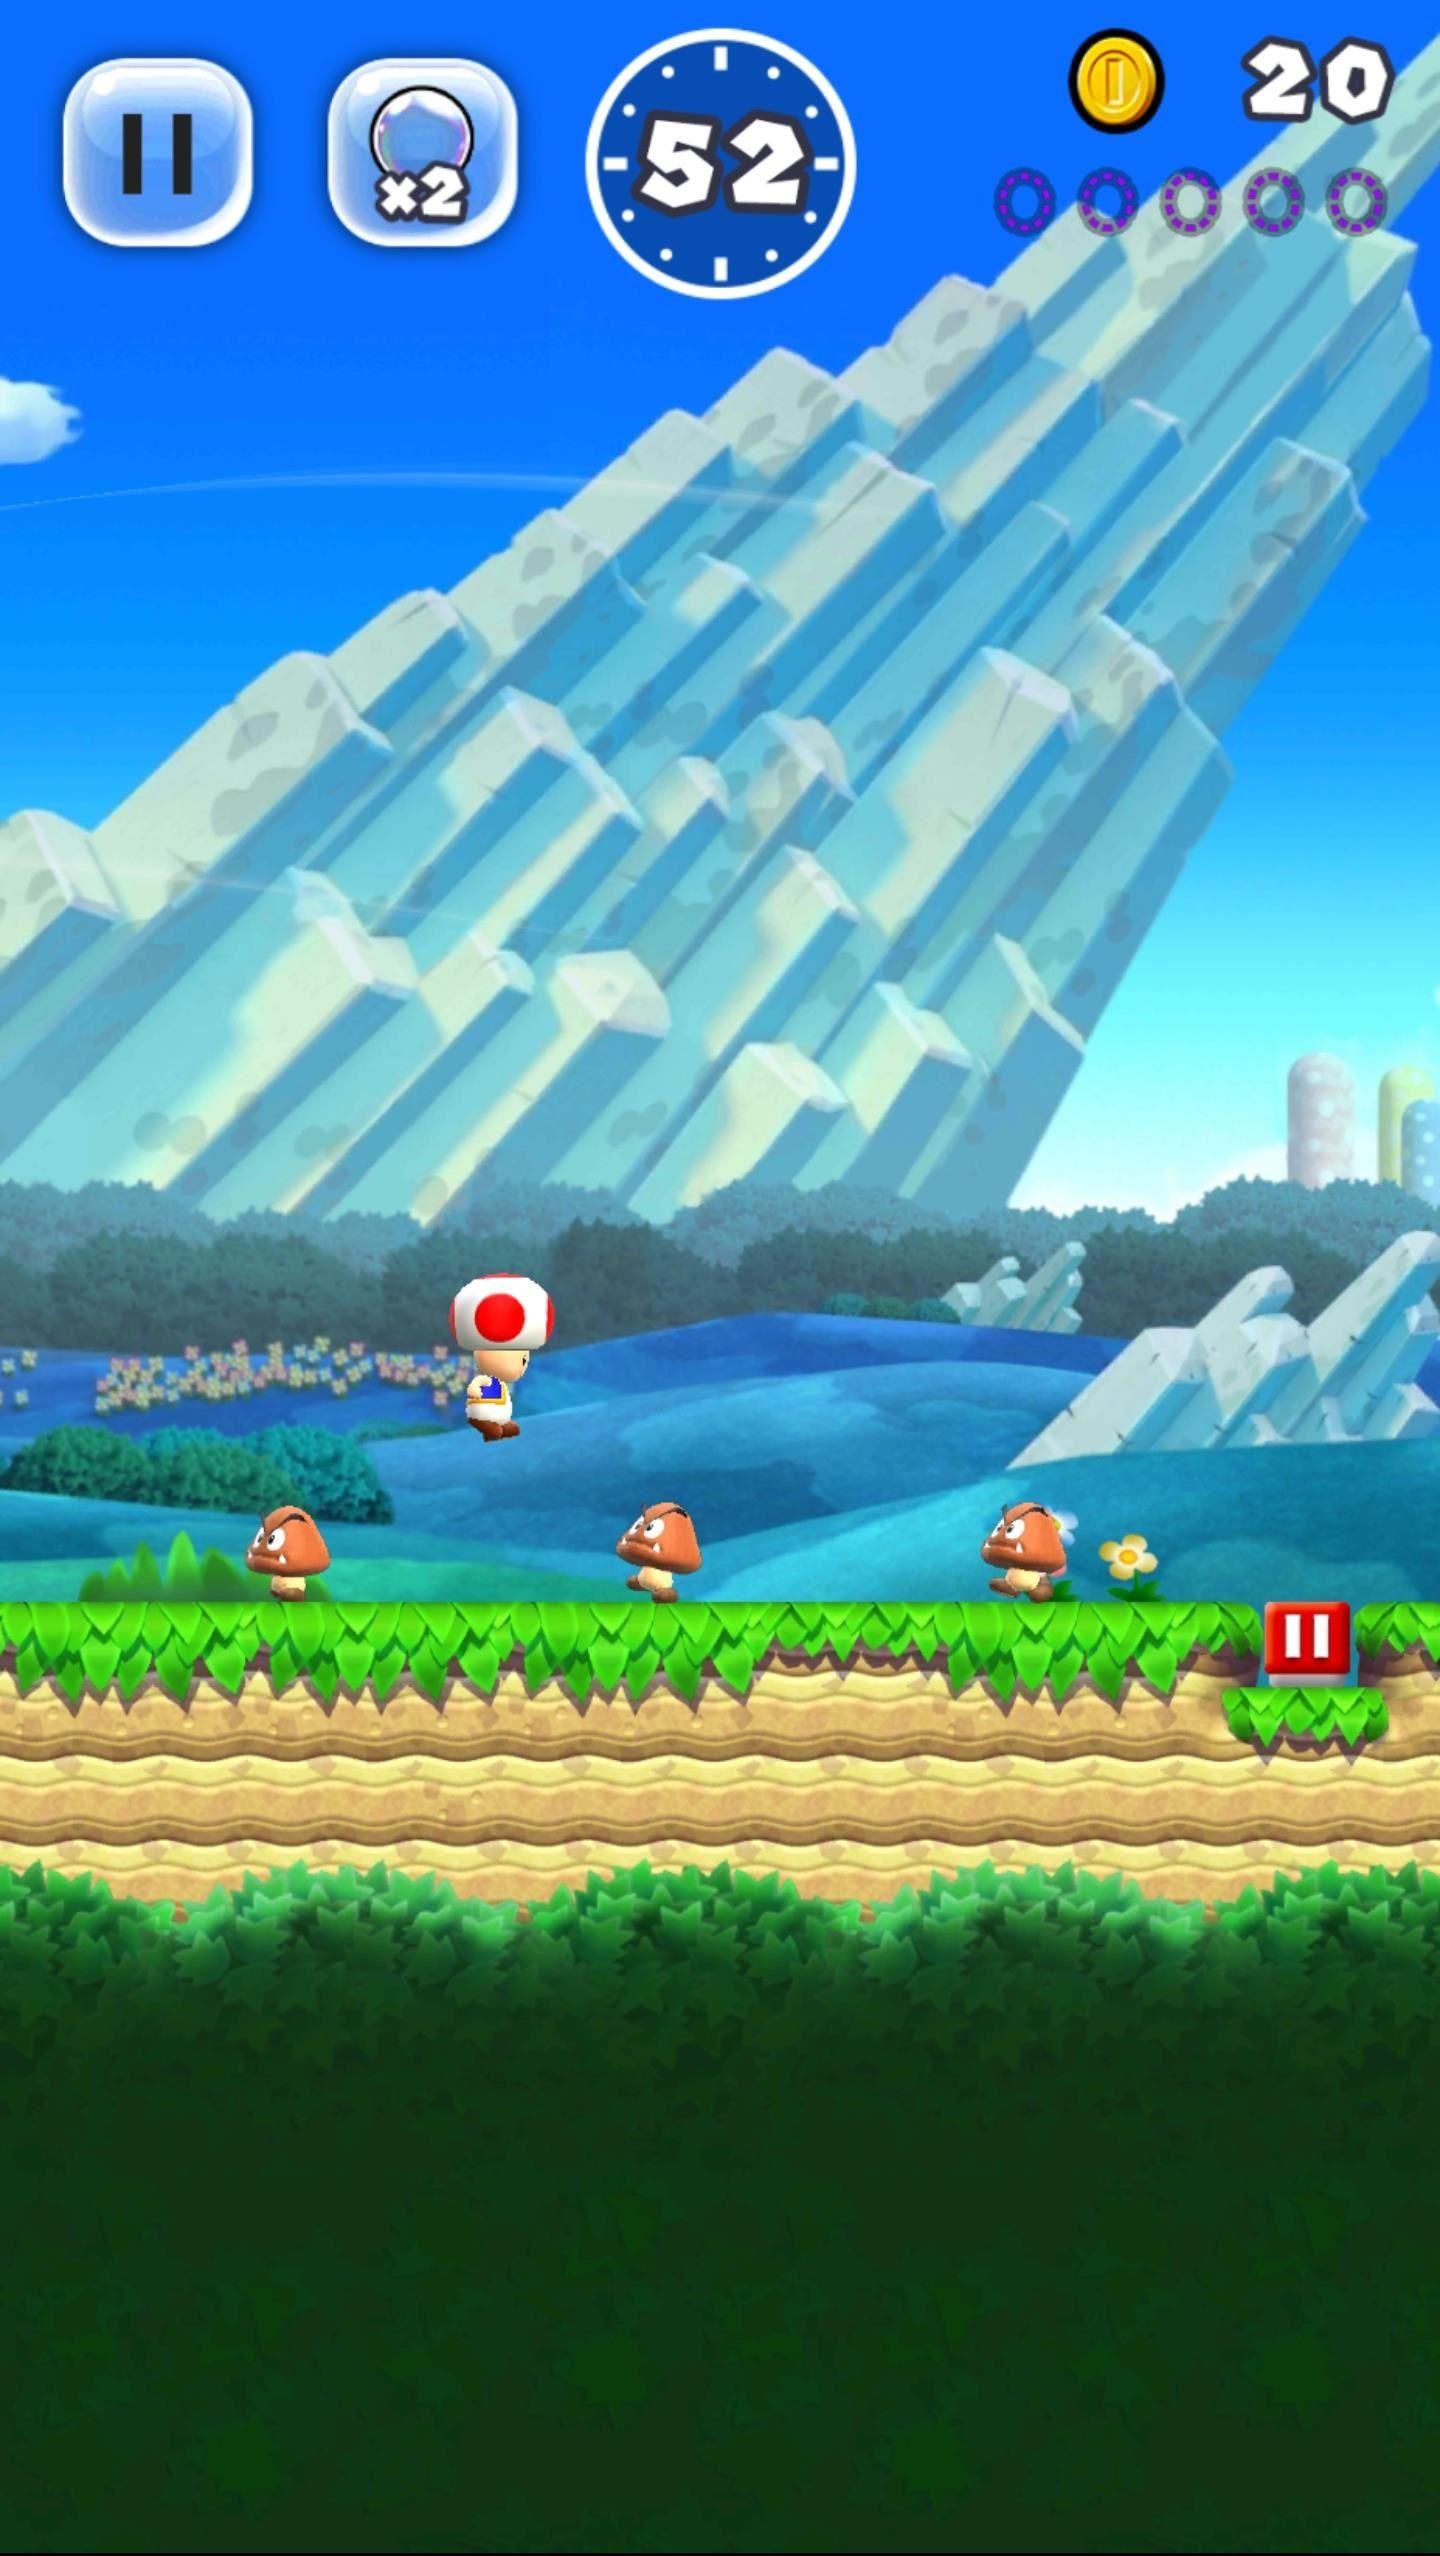 Super Mario Run 101: How to Unlock Toad